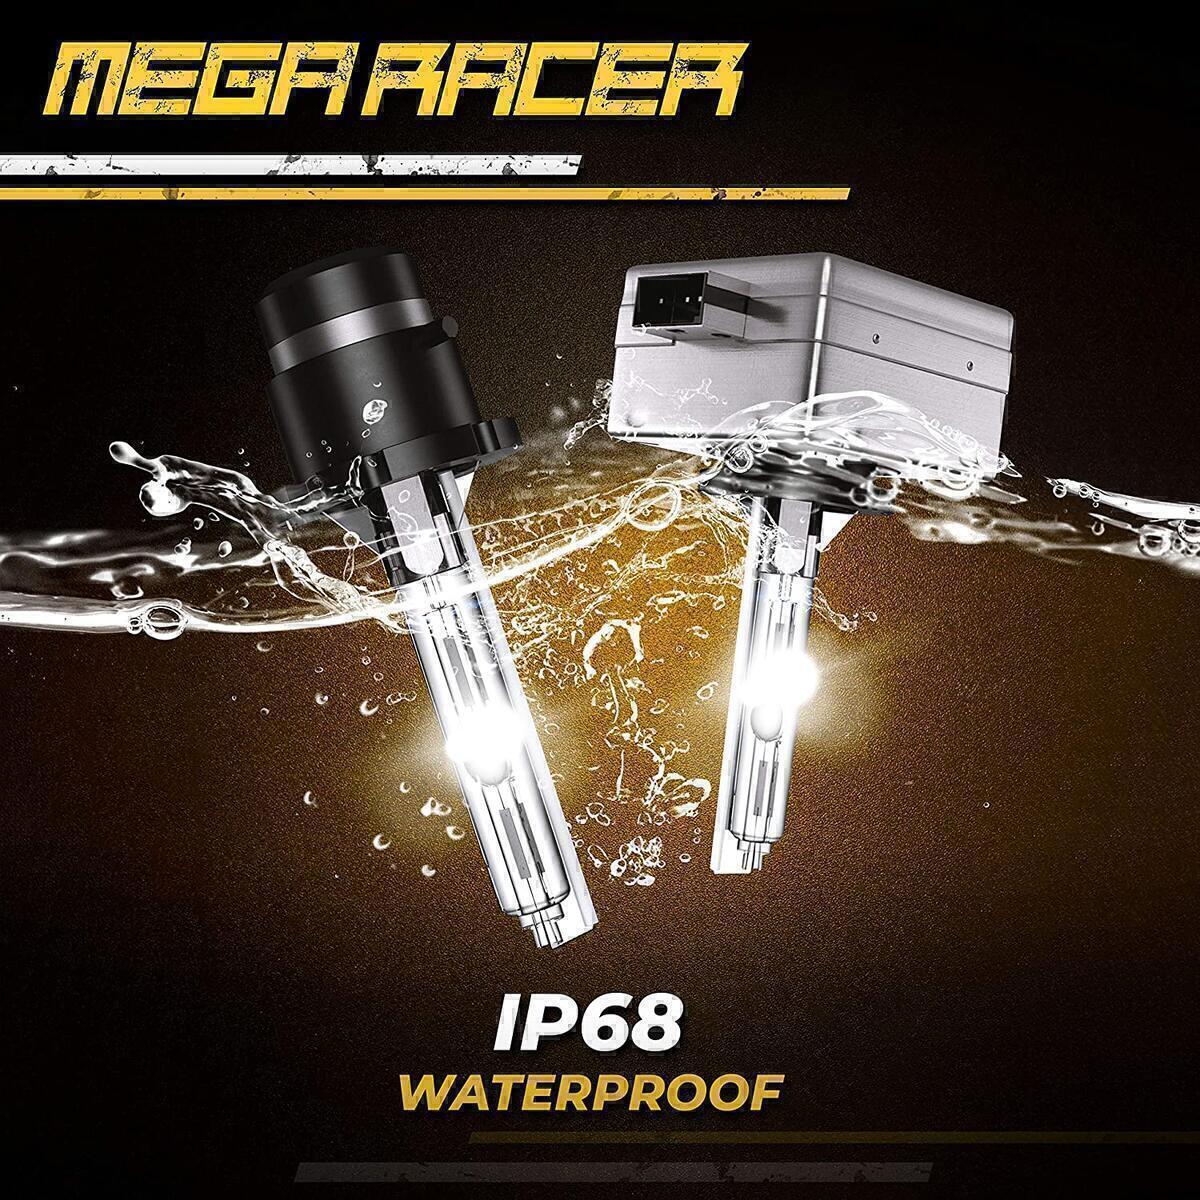 Mega Racer D4S HID Bulbs 10000K Dark Blue Headlights D4S/D4R Xenon Light Bulbs for Low Beam High Beam Replacement Bulbs, 35W 8000 Lumens Metal Stents Base 12V IP68 Waterproof, Pack of 2